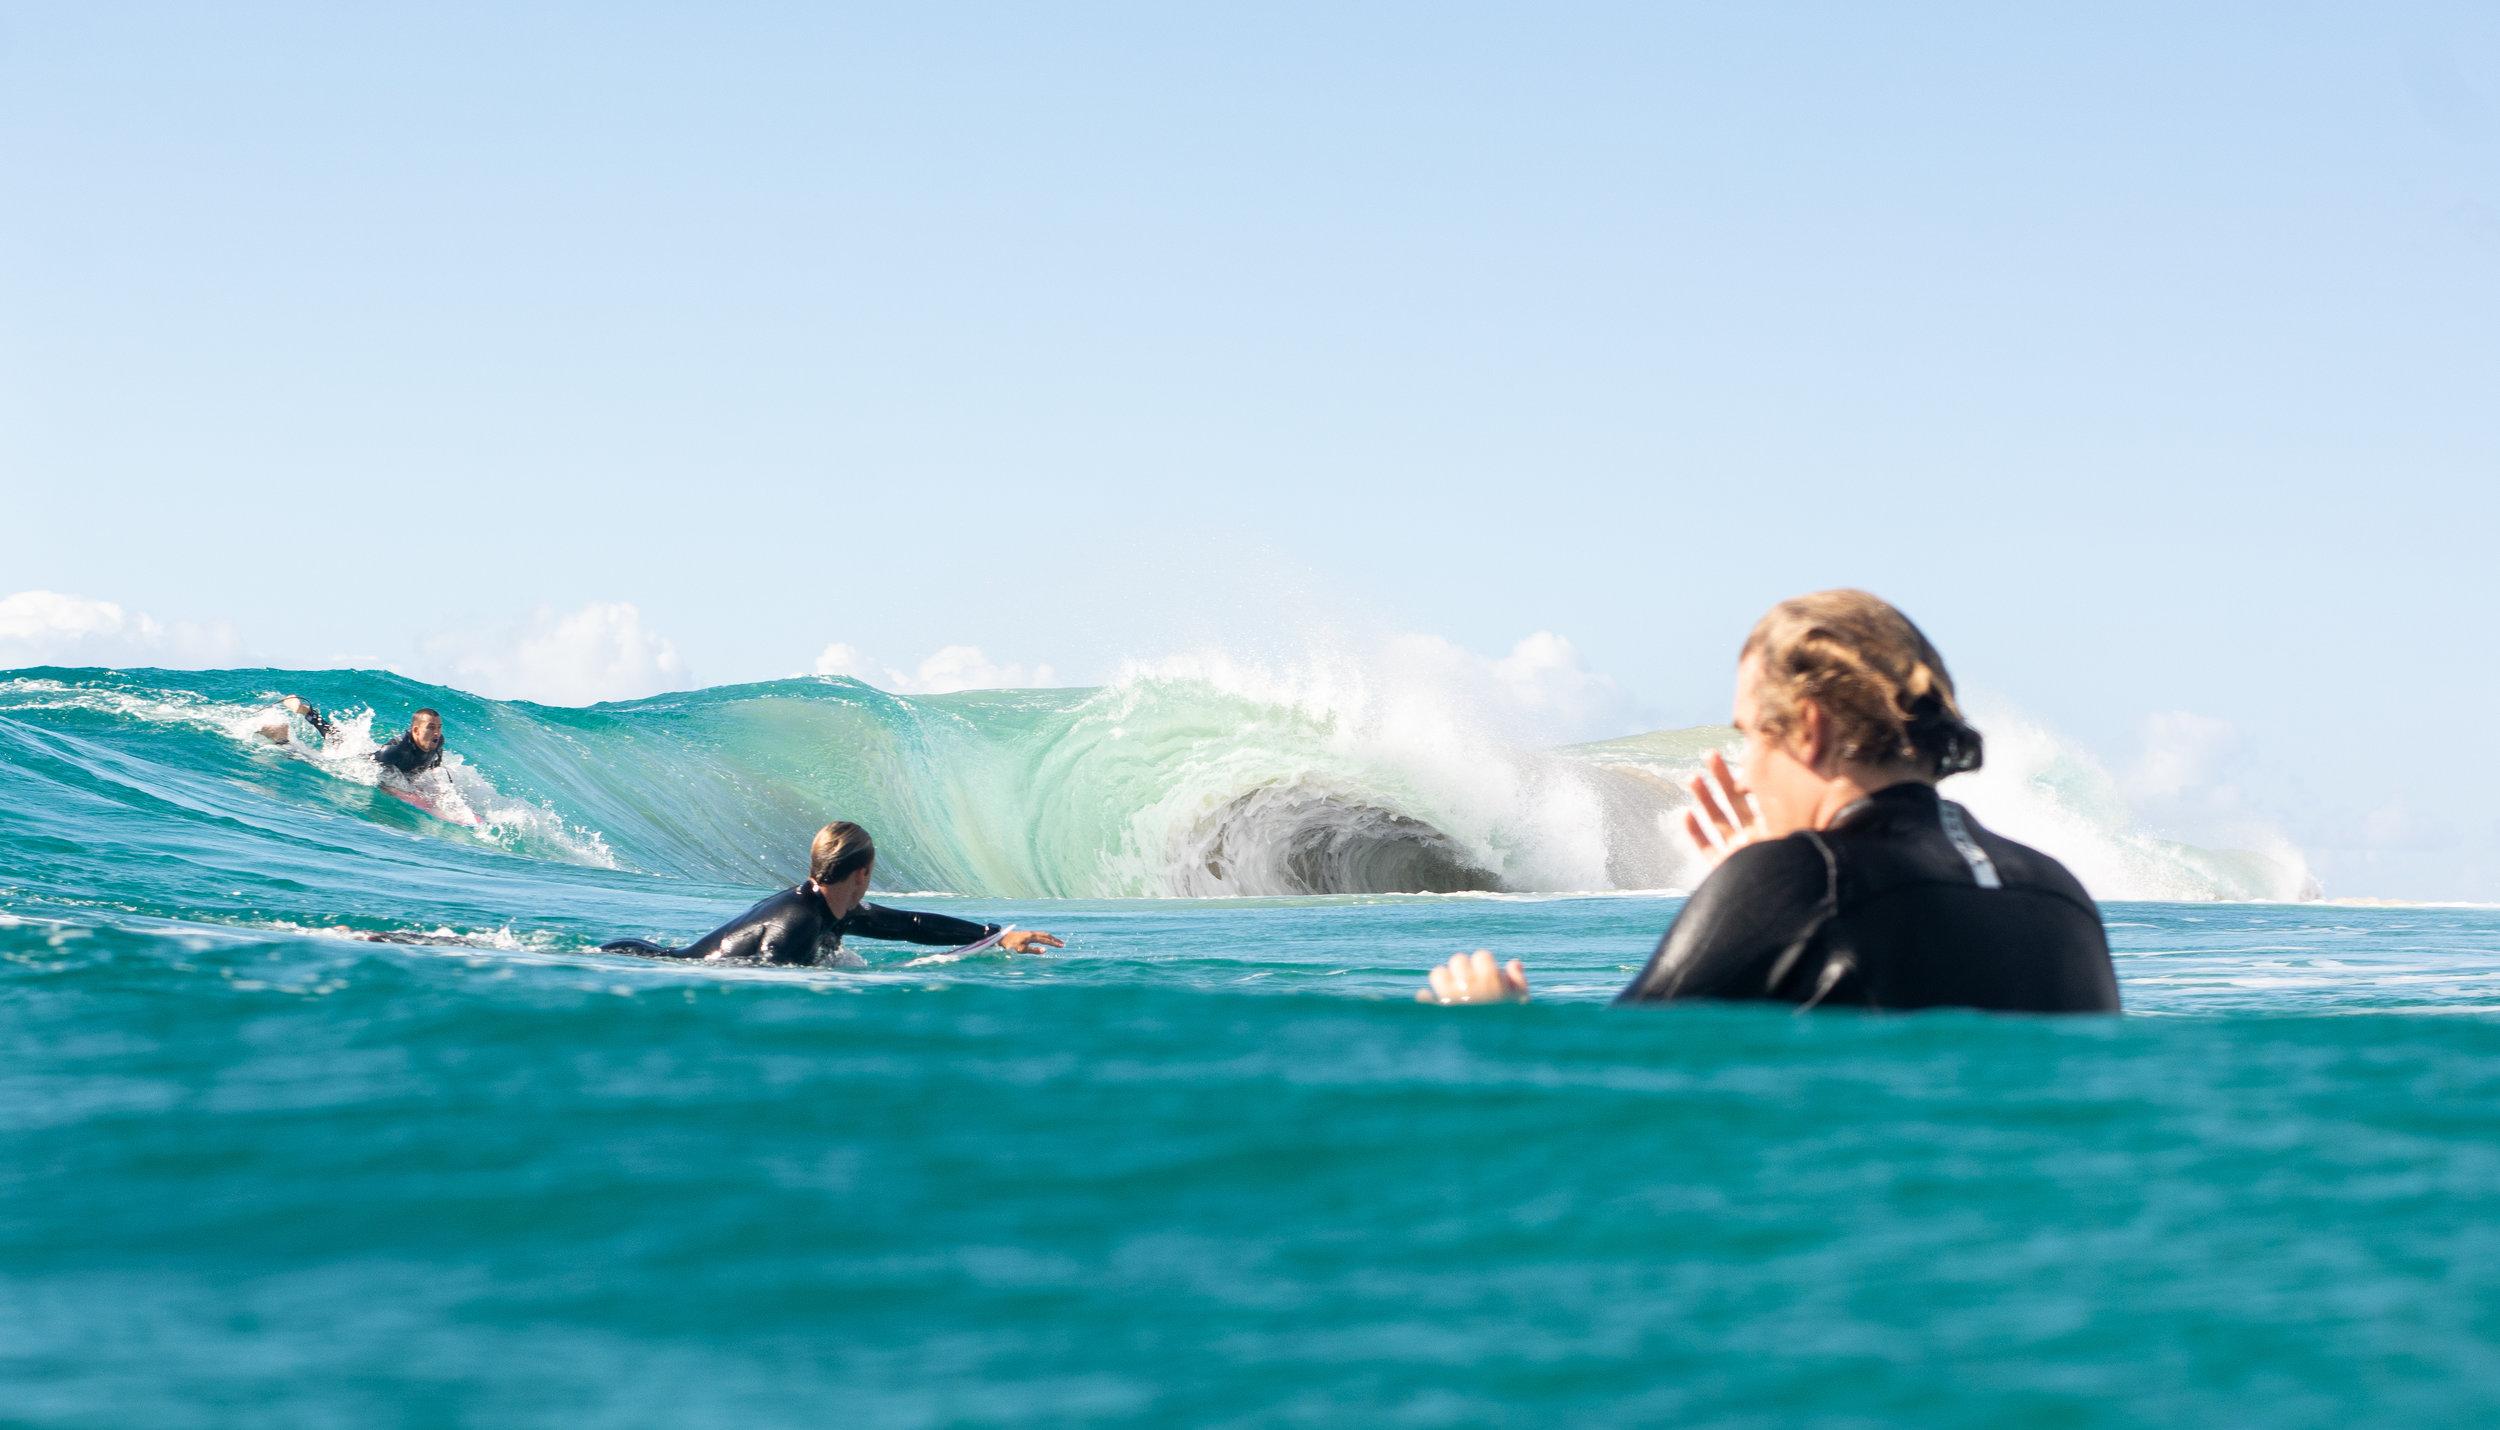 snapper_rocks_australia_saltwater_2